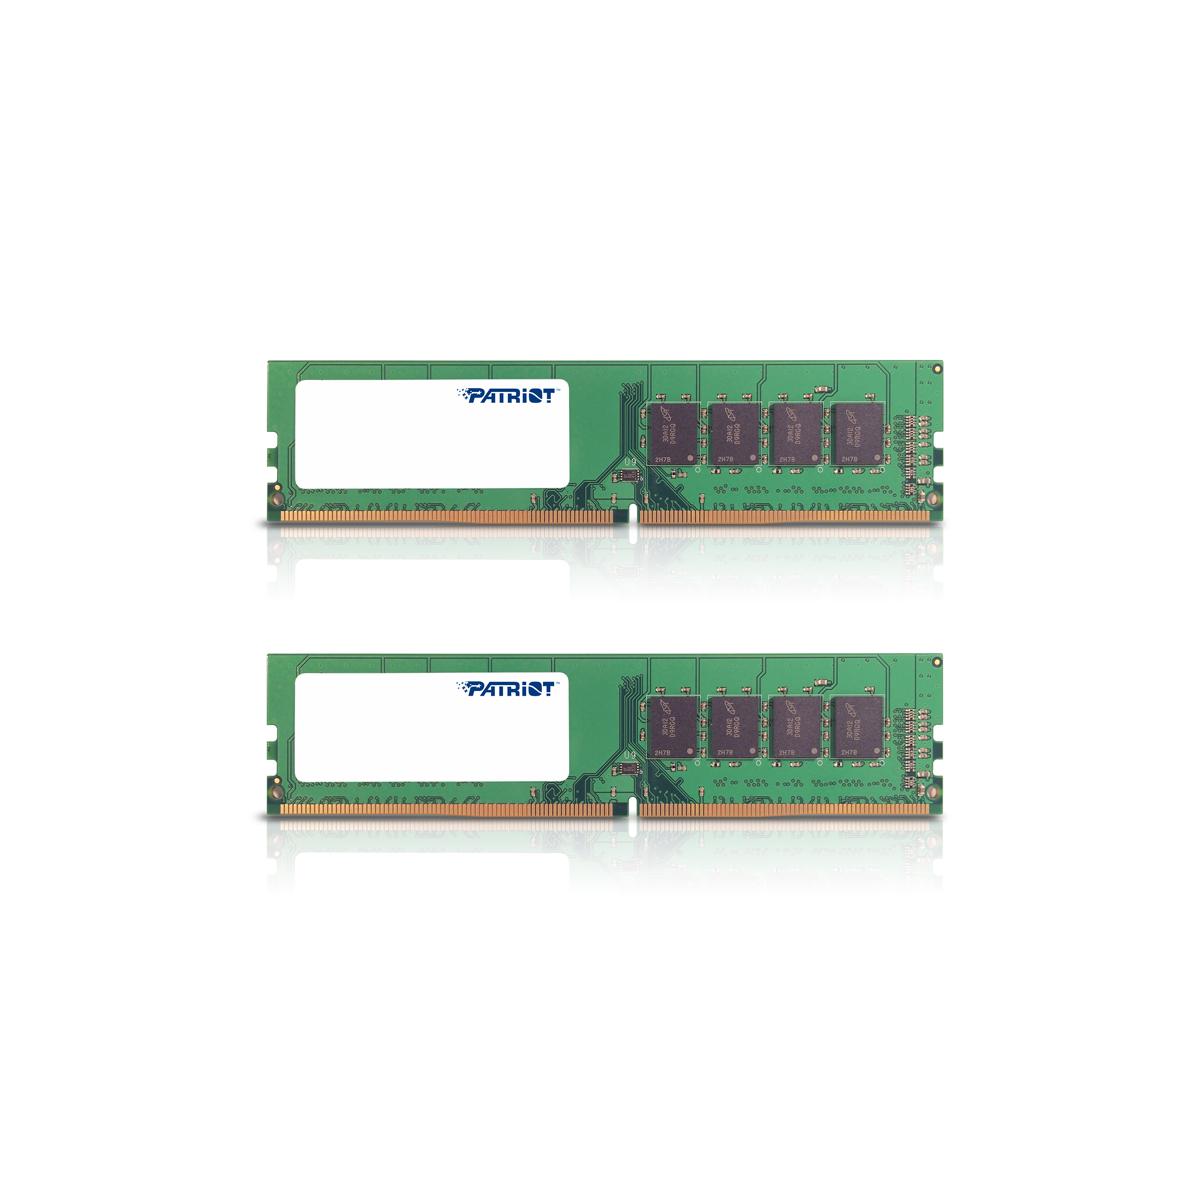 8GB DDR4-2133MHz Patriot CL15, kit 2x4GB